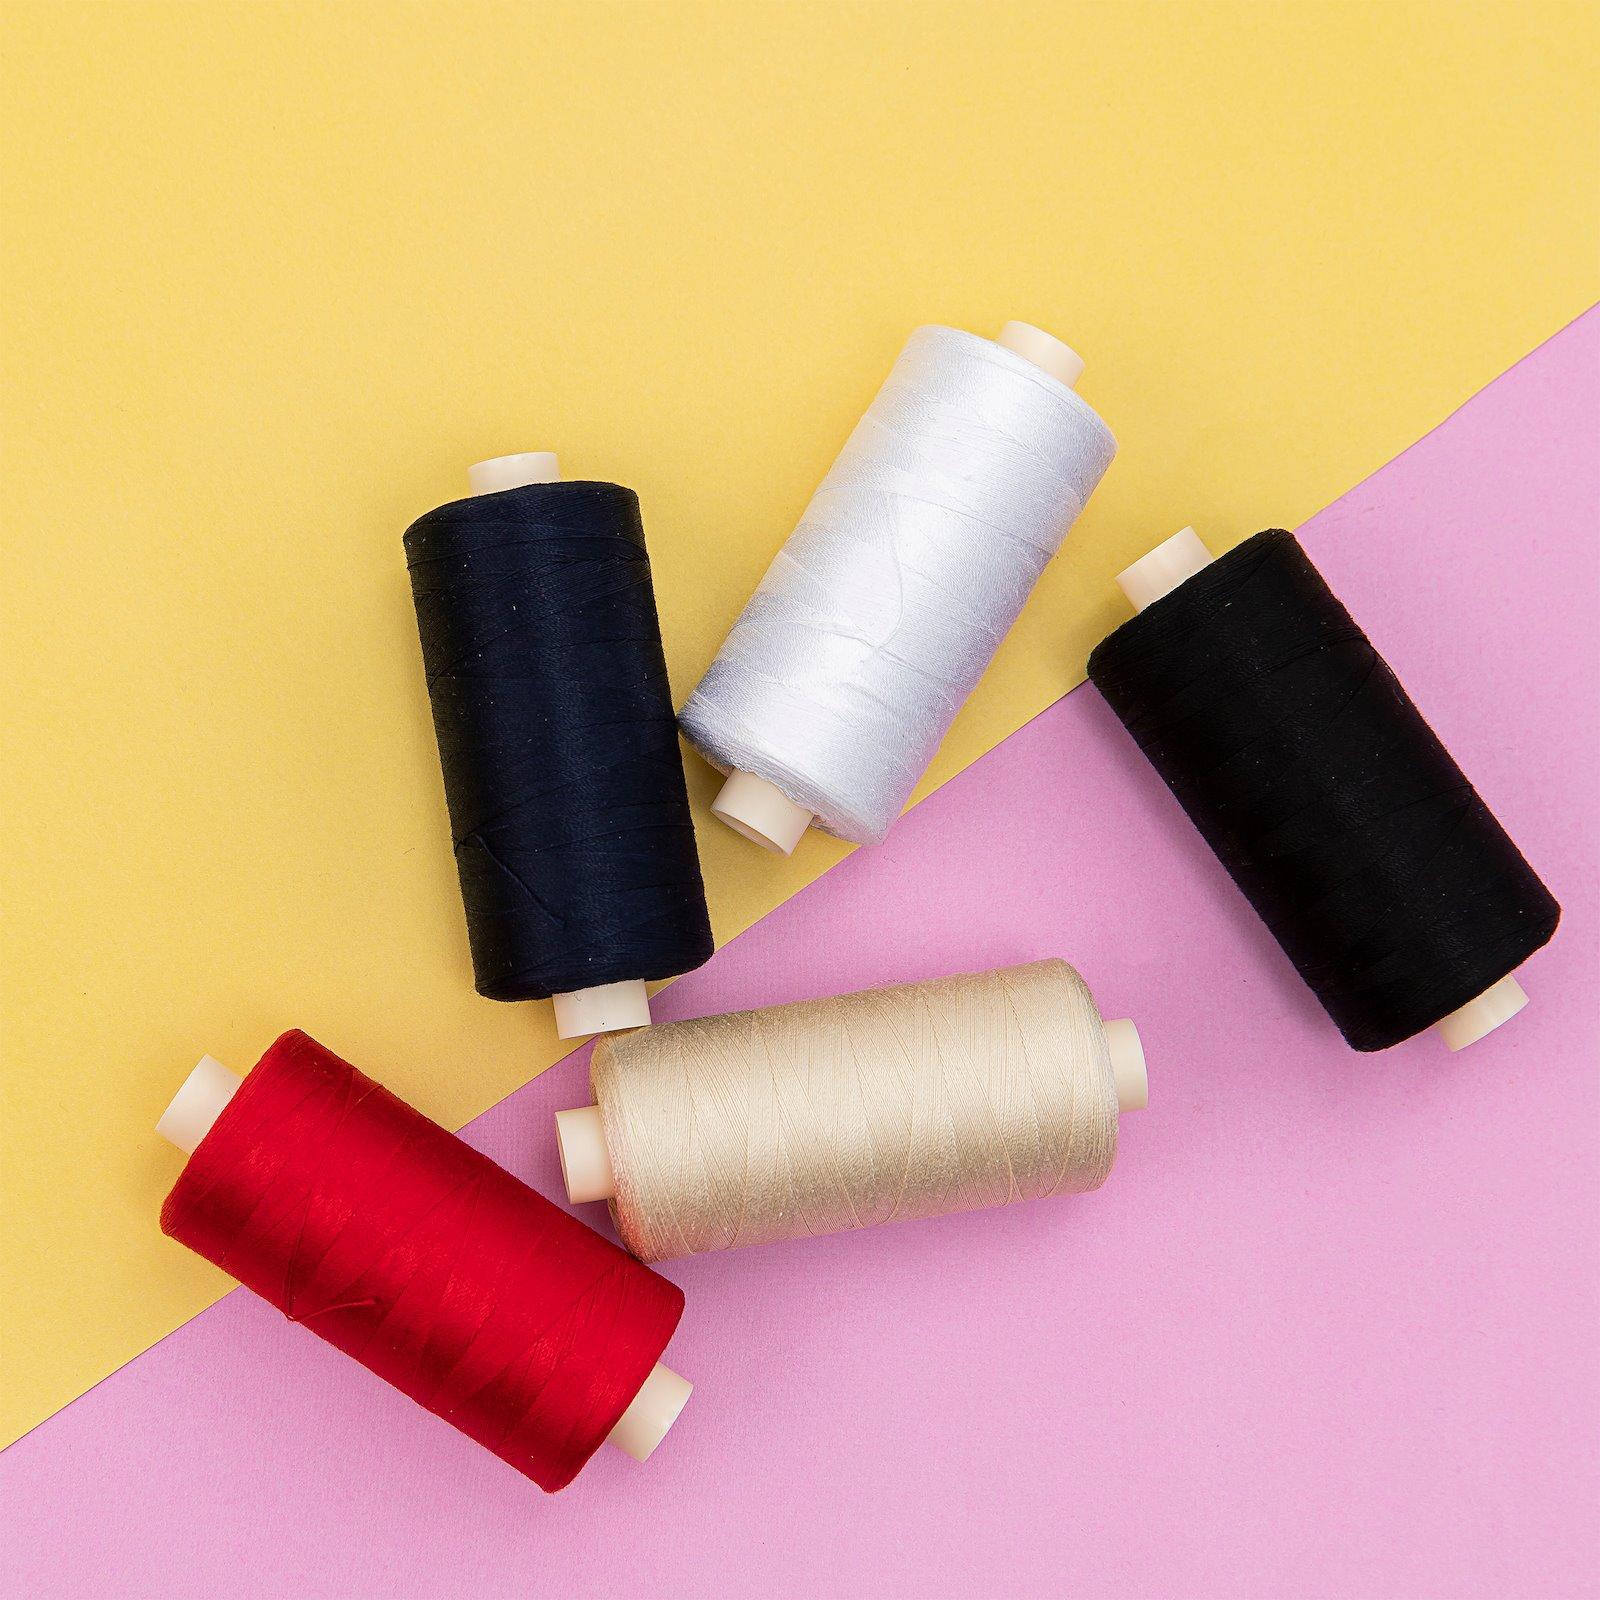 Sewing thread cotton black 1000m 14011_14023_14001_14002_14043_bundle